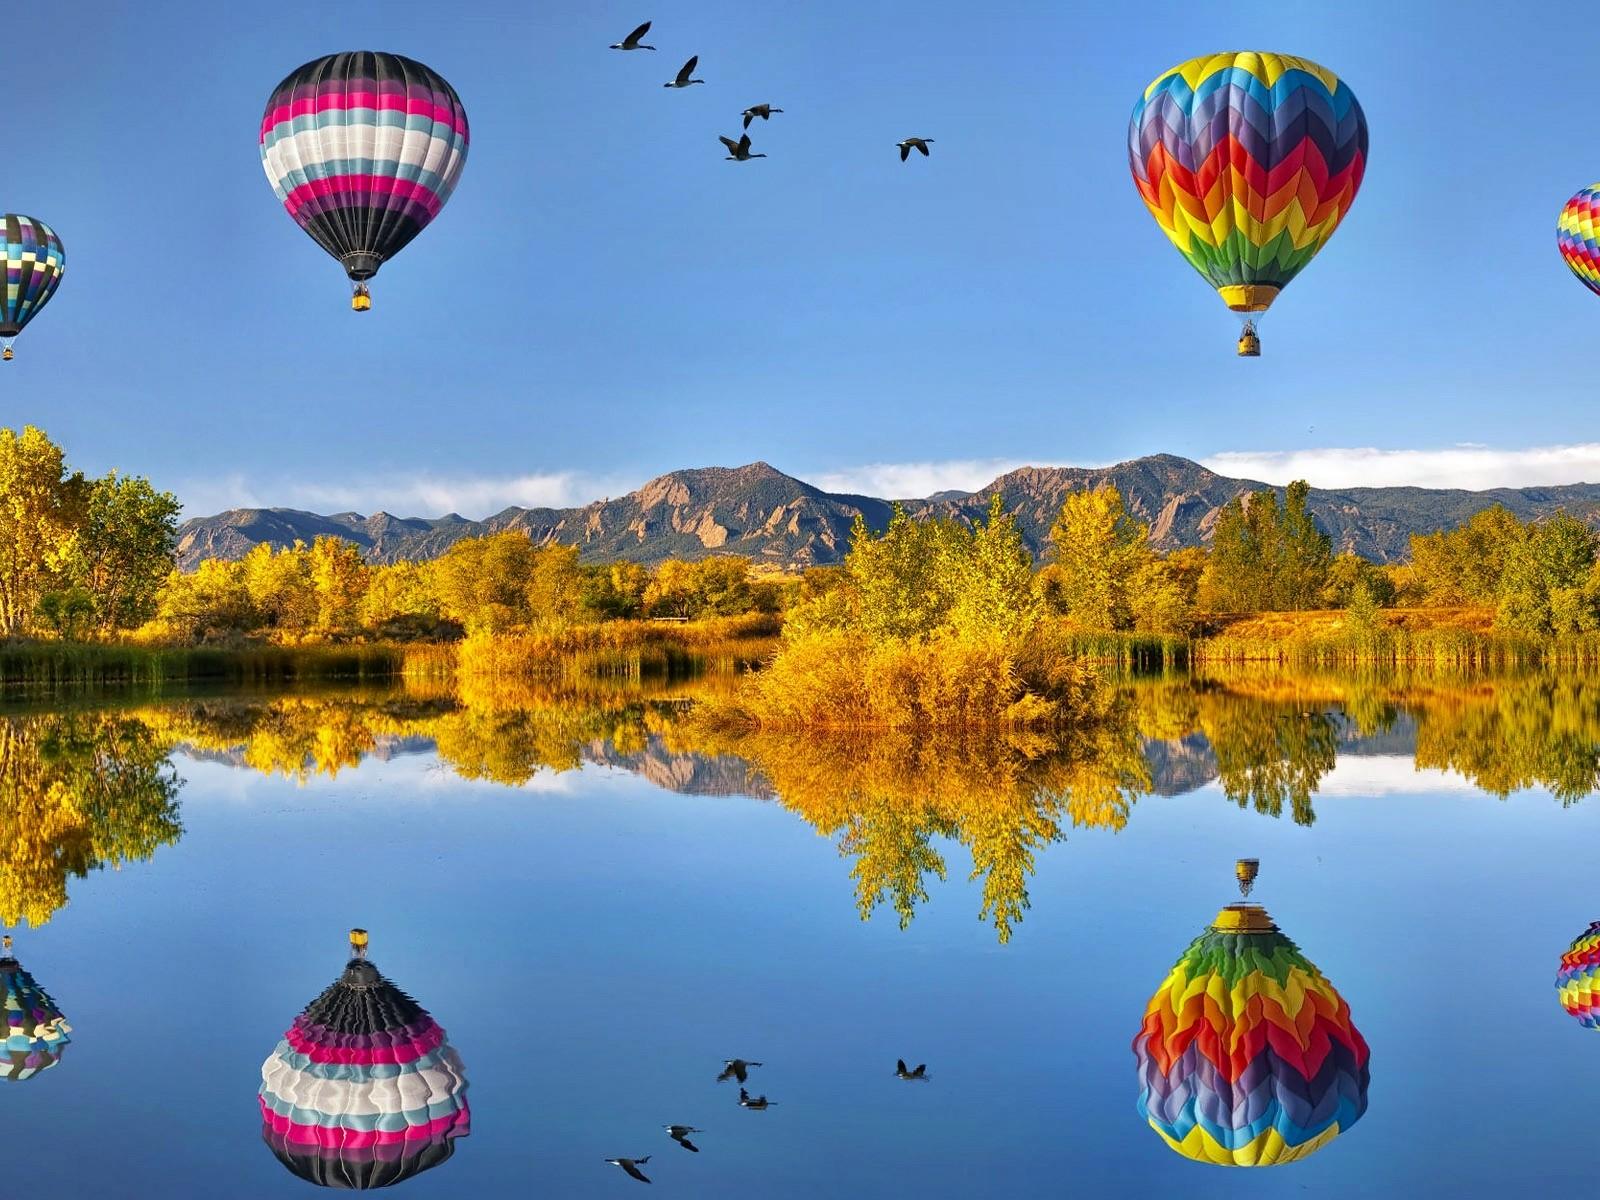 air balloon wallpapers air balloon wallpapers air balloon wallpapers 1600x1200